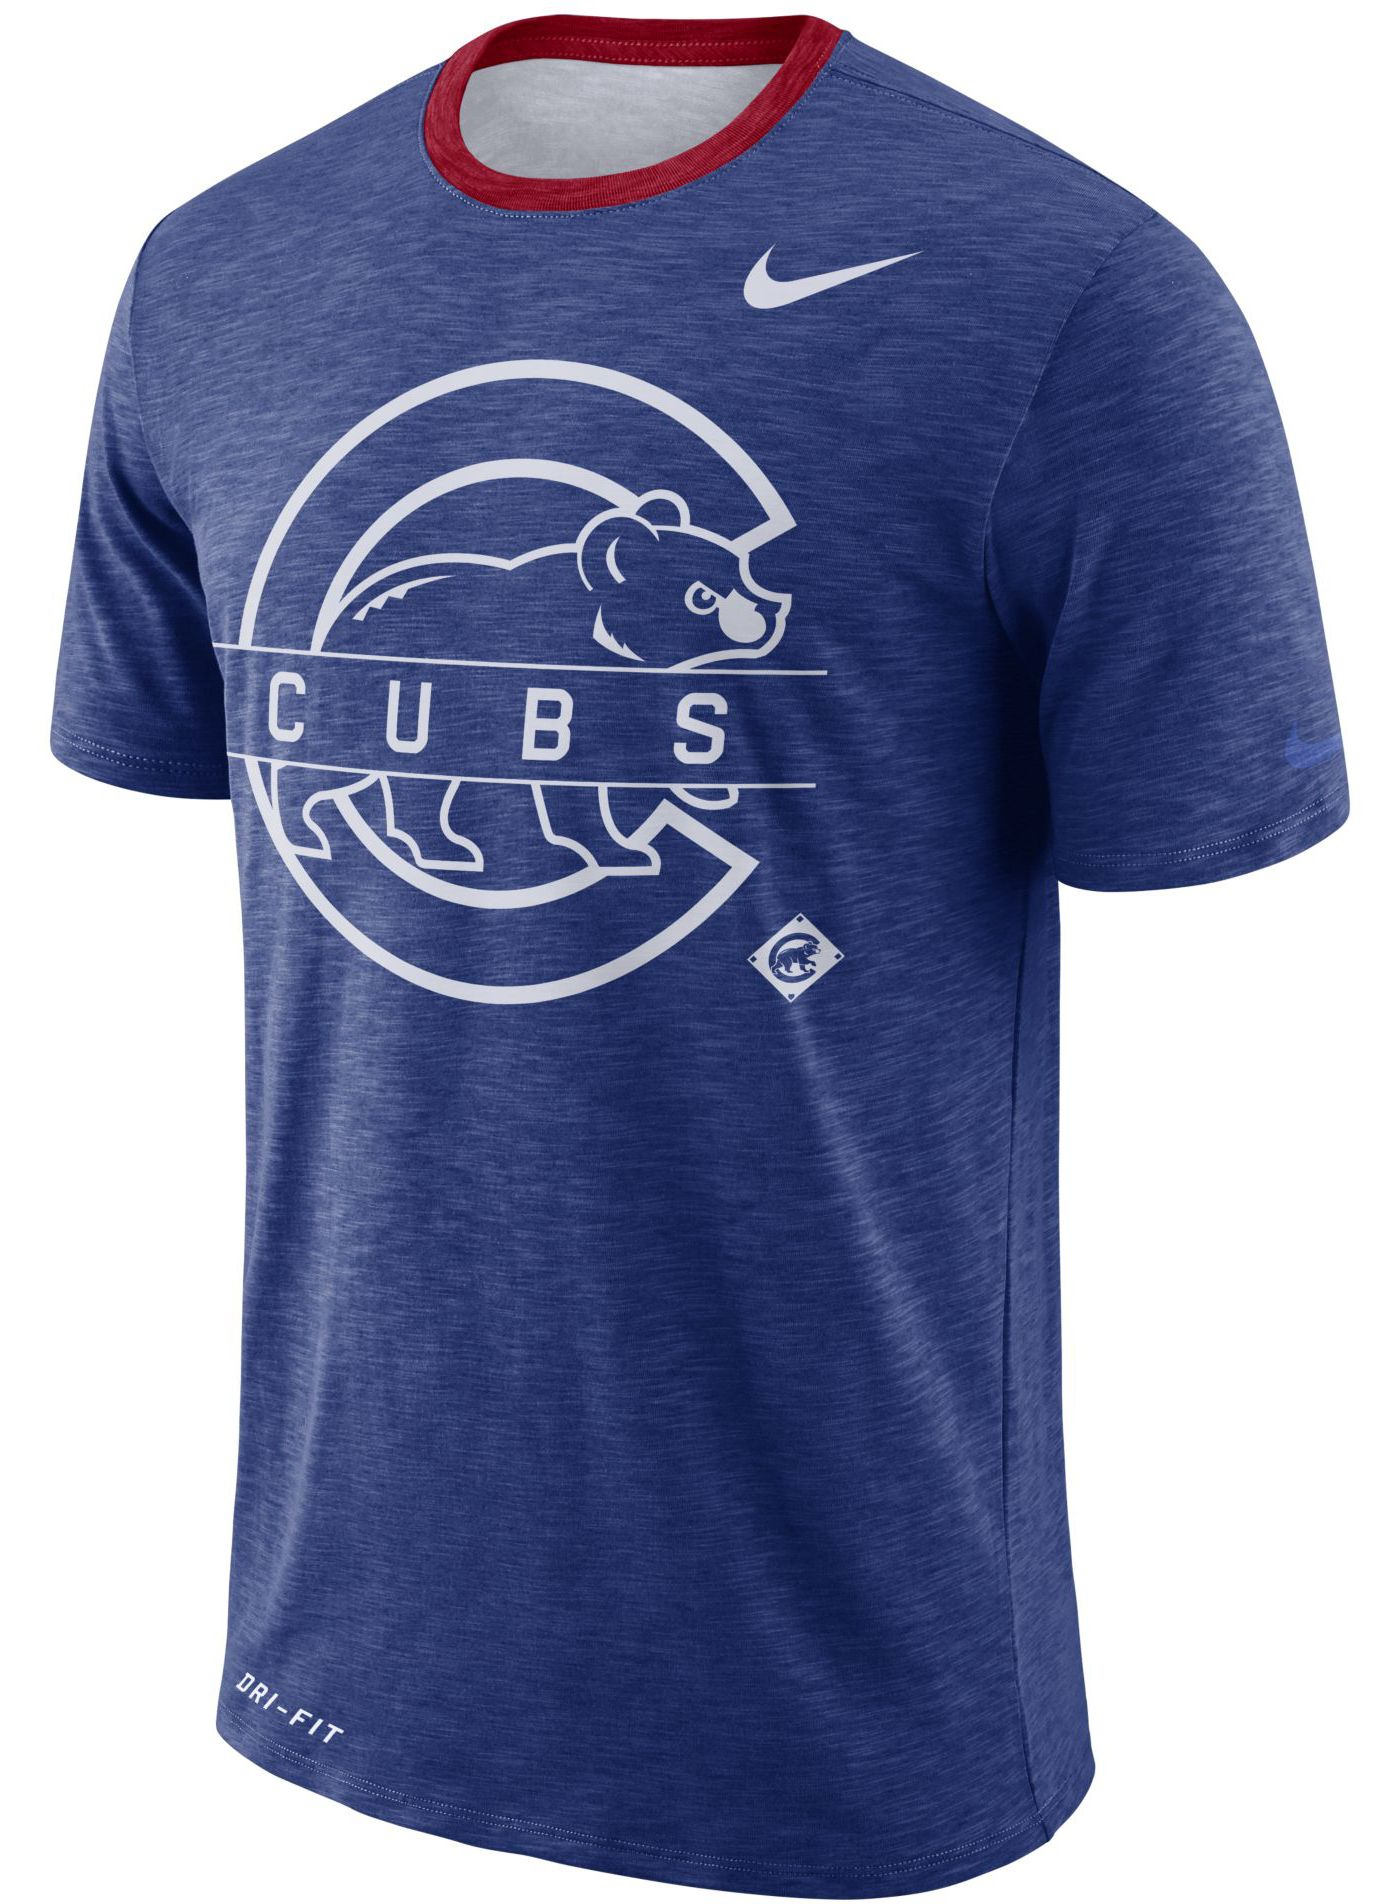 Nike Men's Chicago Cubs Dri-FIT Slub Logo T-Shirt